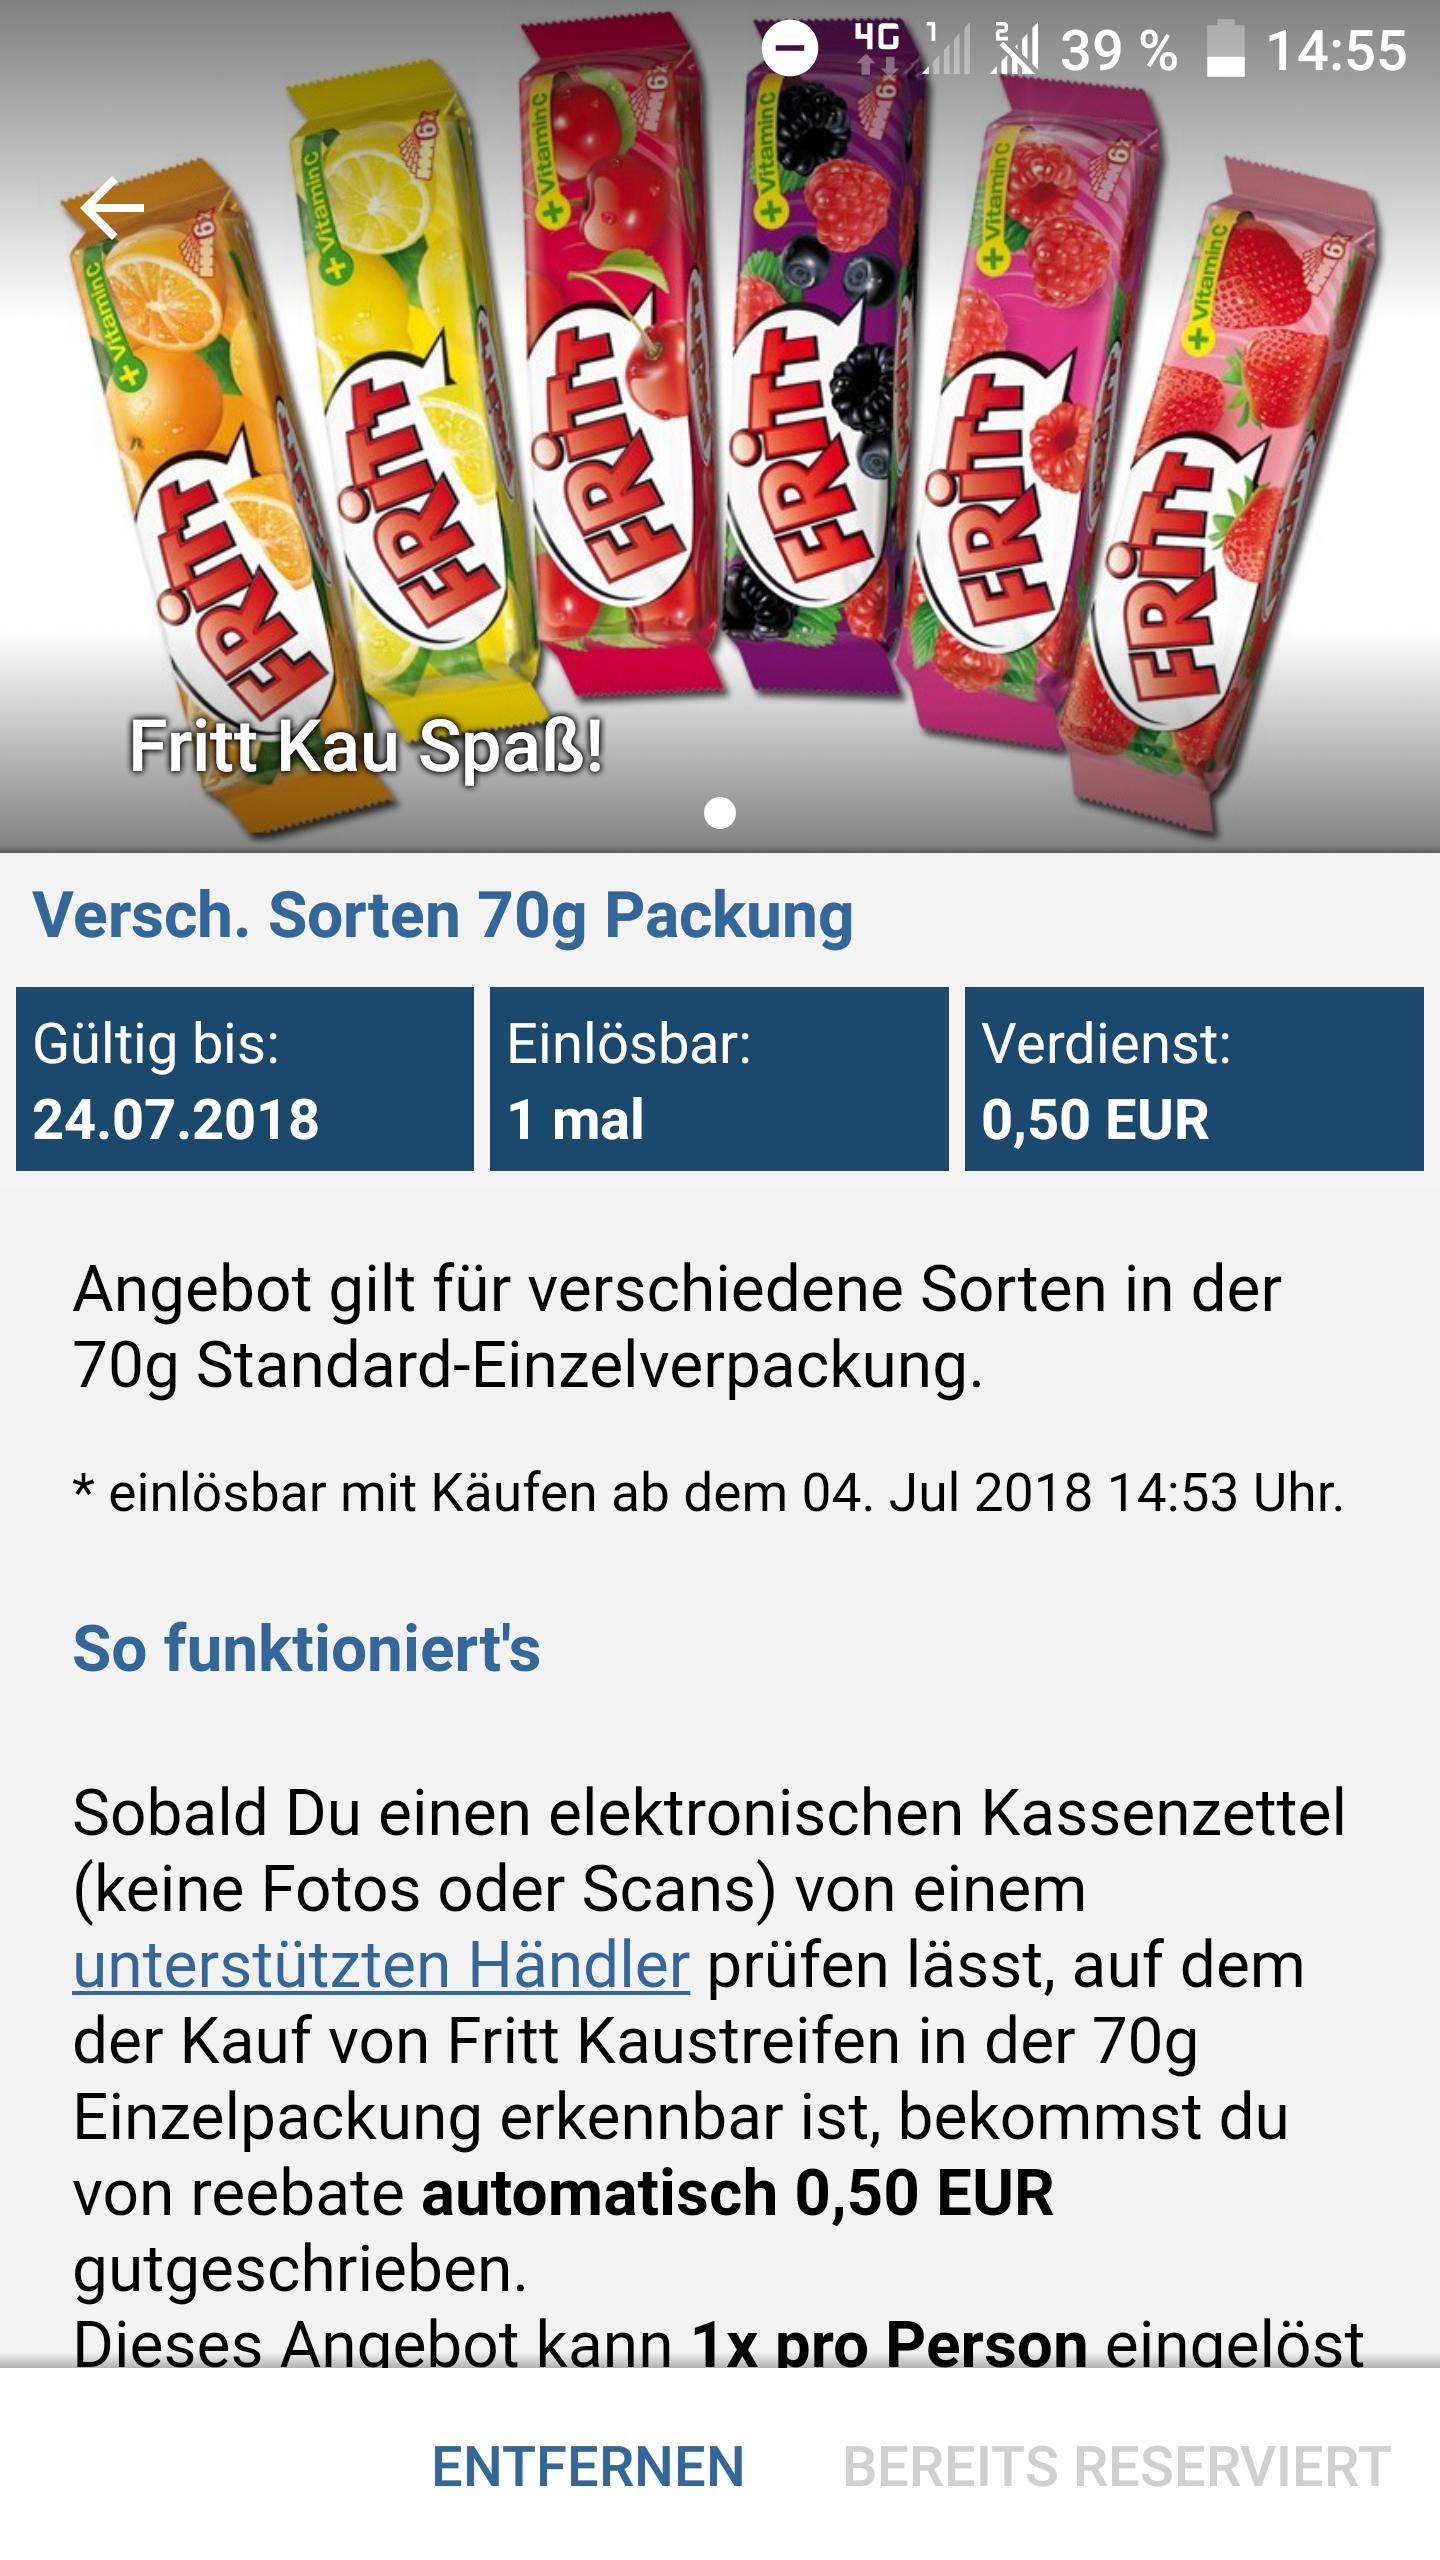 Reebate / Rewe kostenloses Fritt Kau Spaß - Freebie